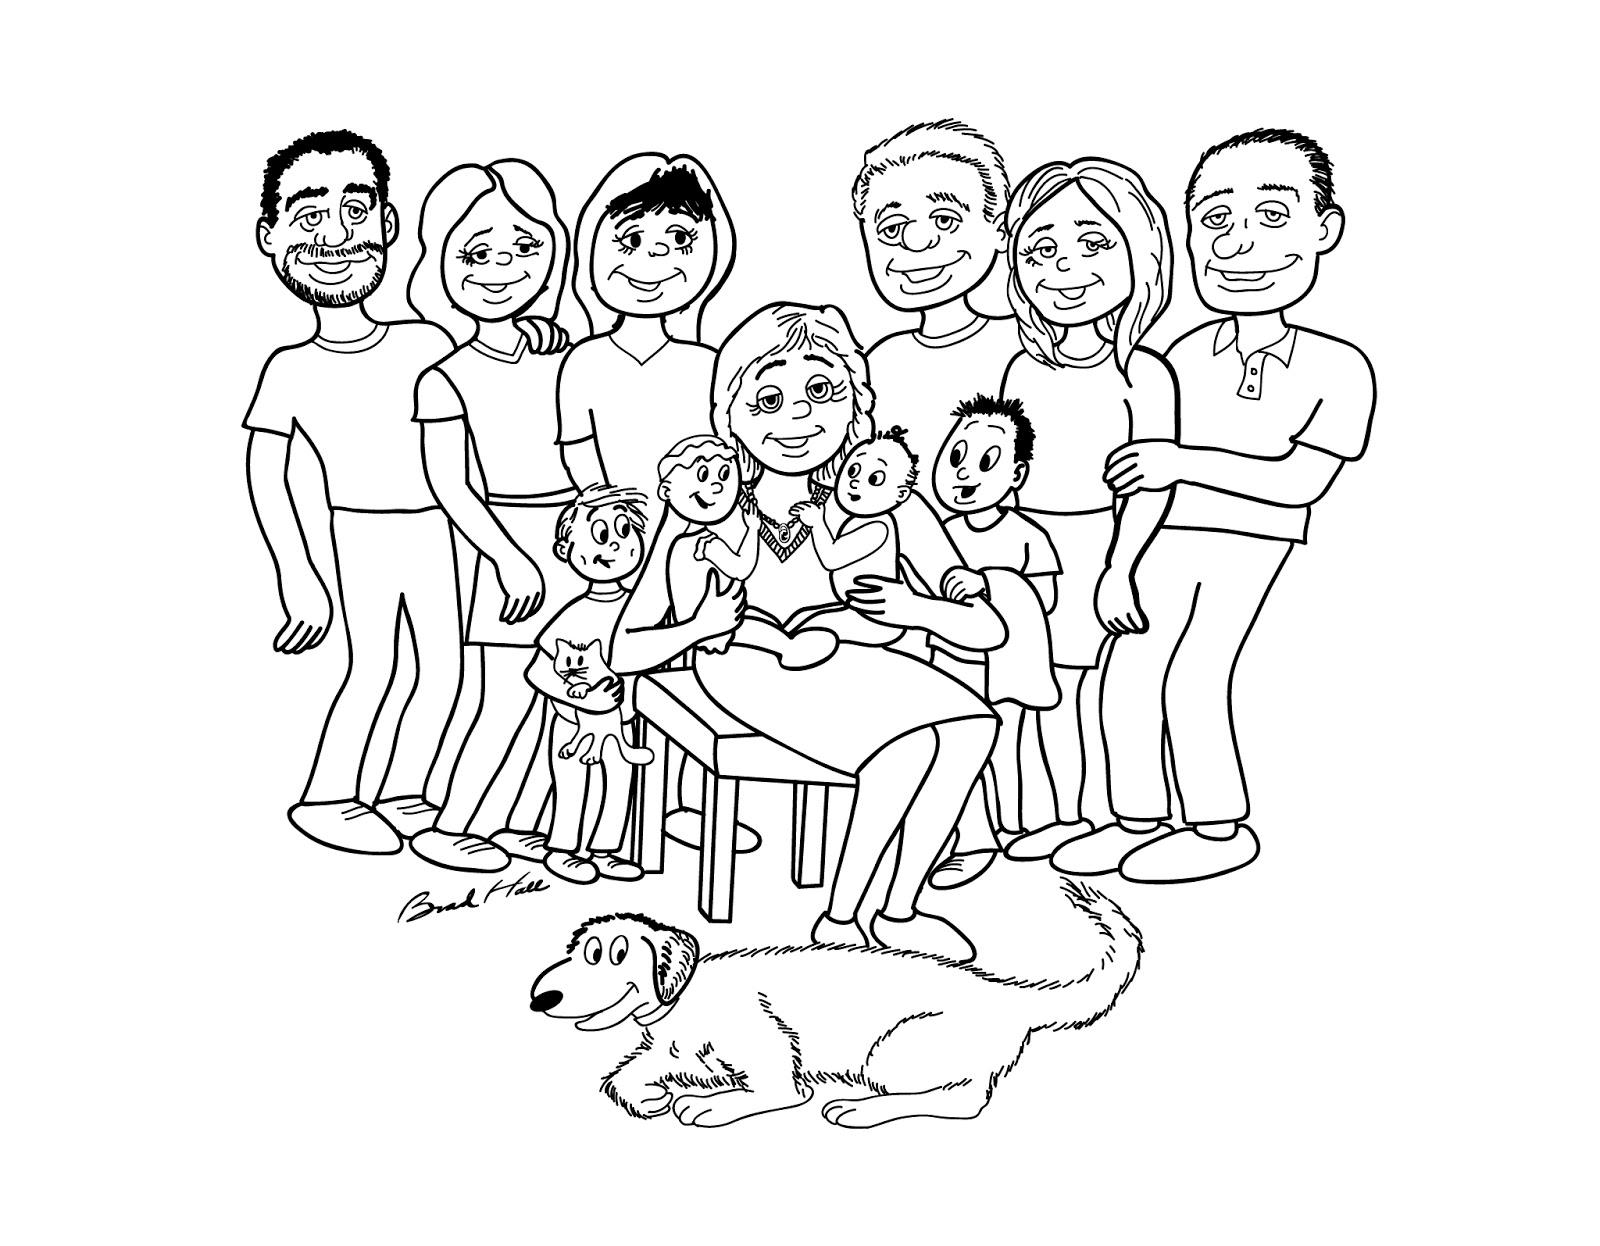 1600x1246 Bradhallart Blog Cartoon Colors In Adobe Illustrator